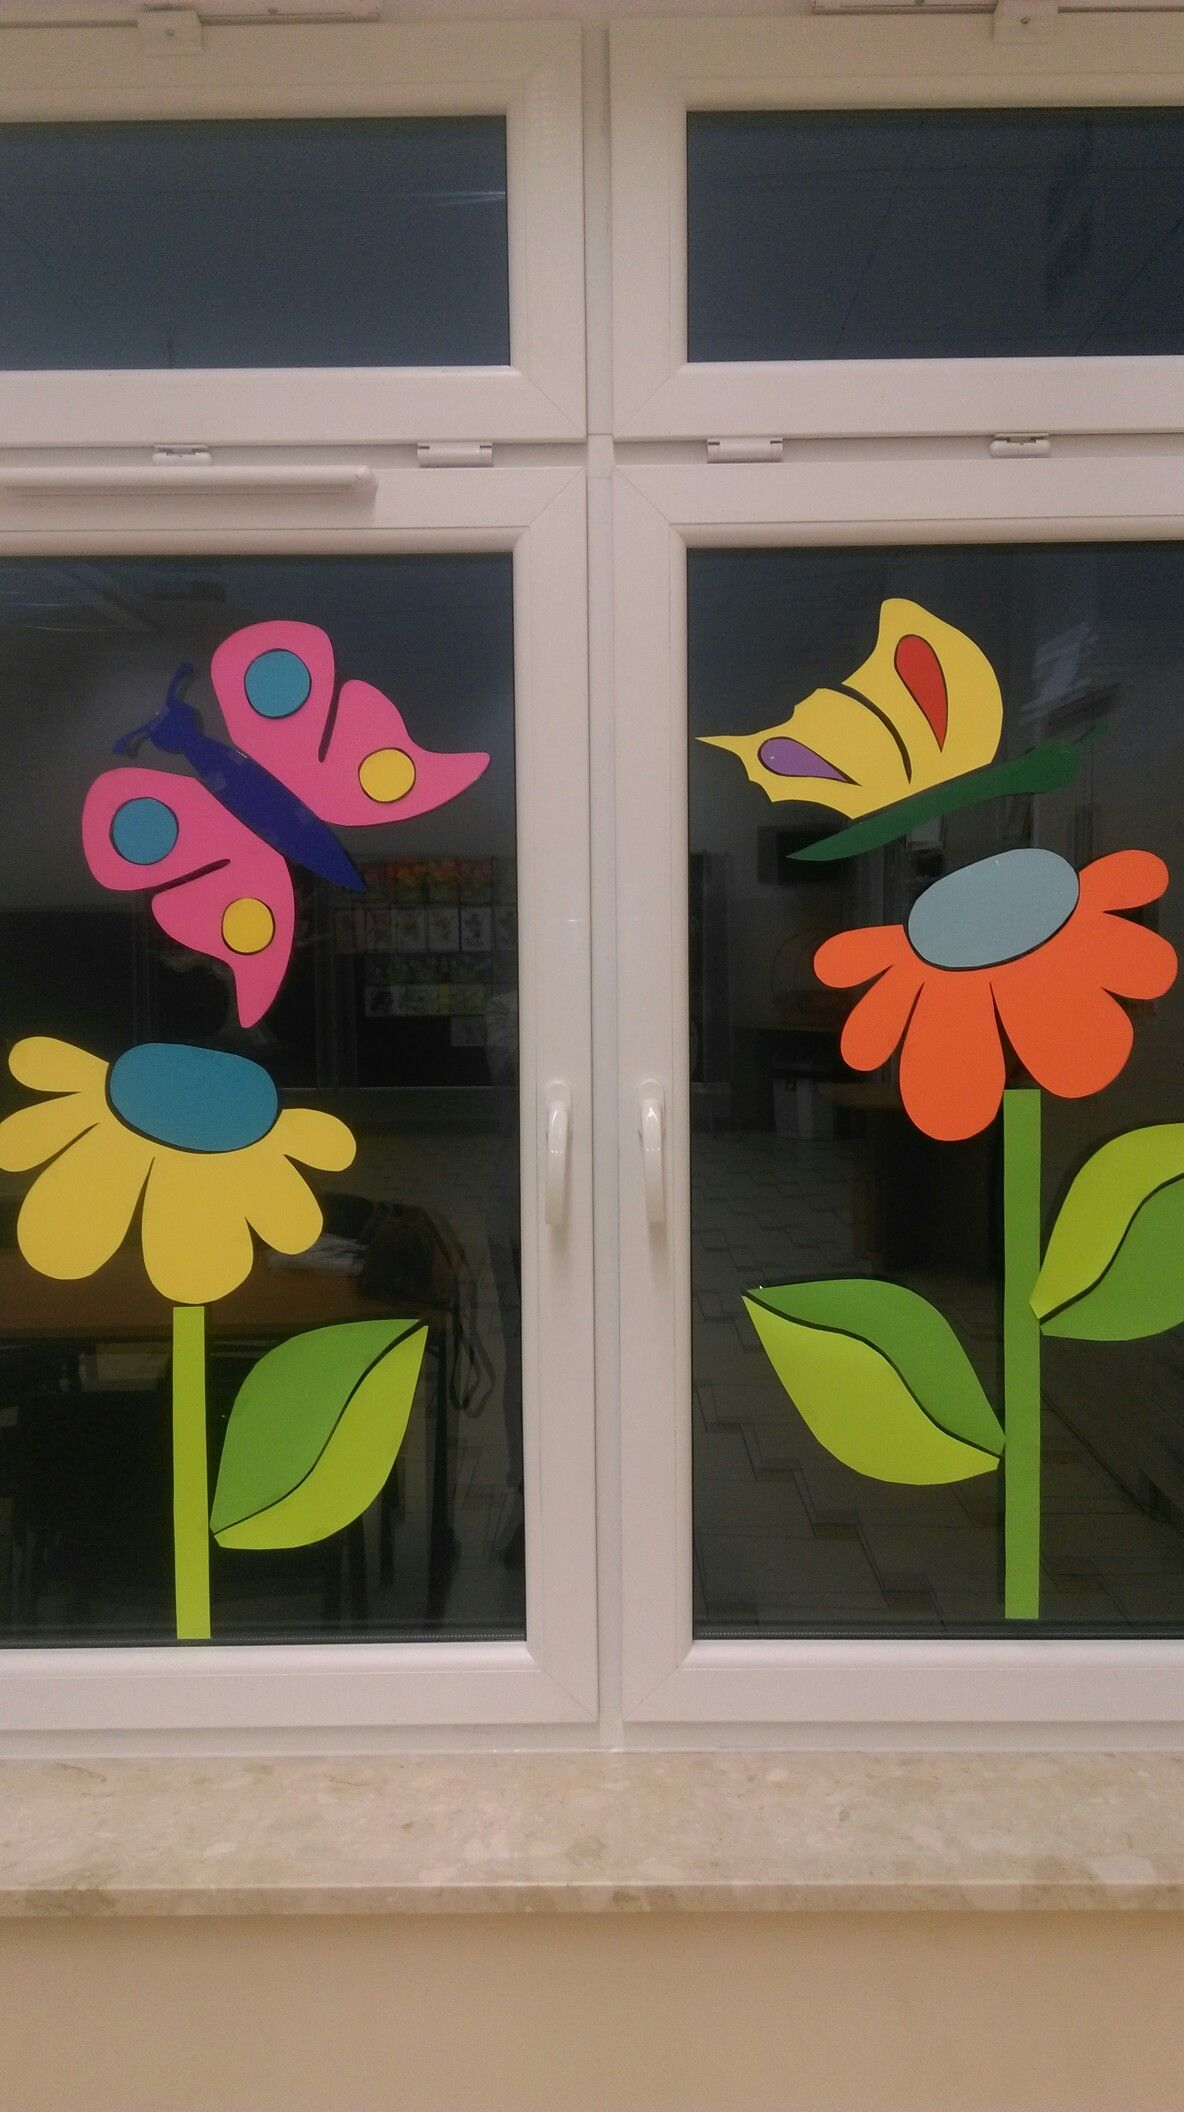 Pin By Natalia Vrbova On Dekoracje School Window Decorations Classroom Window Decorations Spring Decor Diy